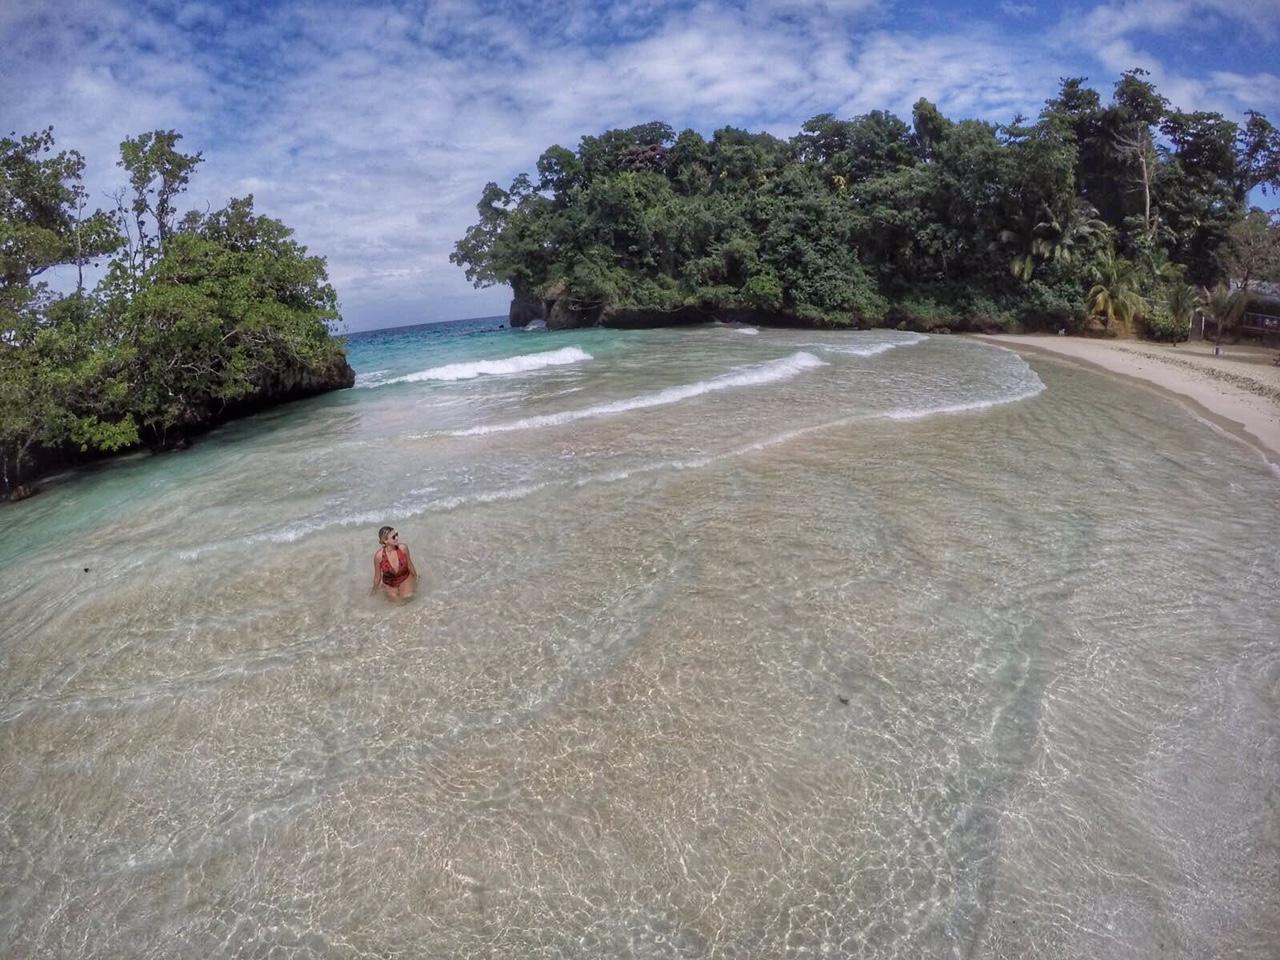 frenchmans-cove-port-antonio-portland-jamaica-dicas-praias-09